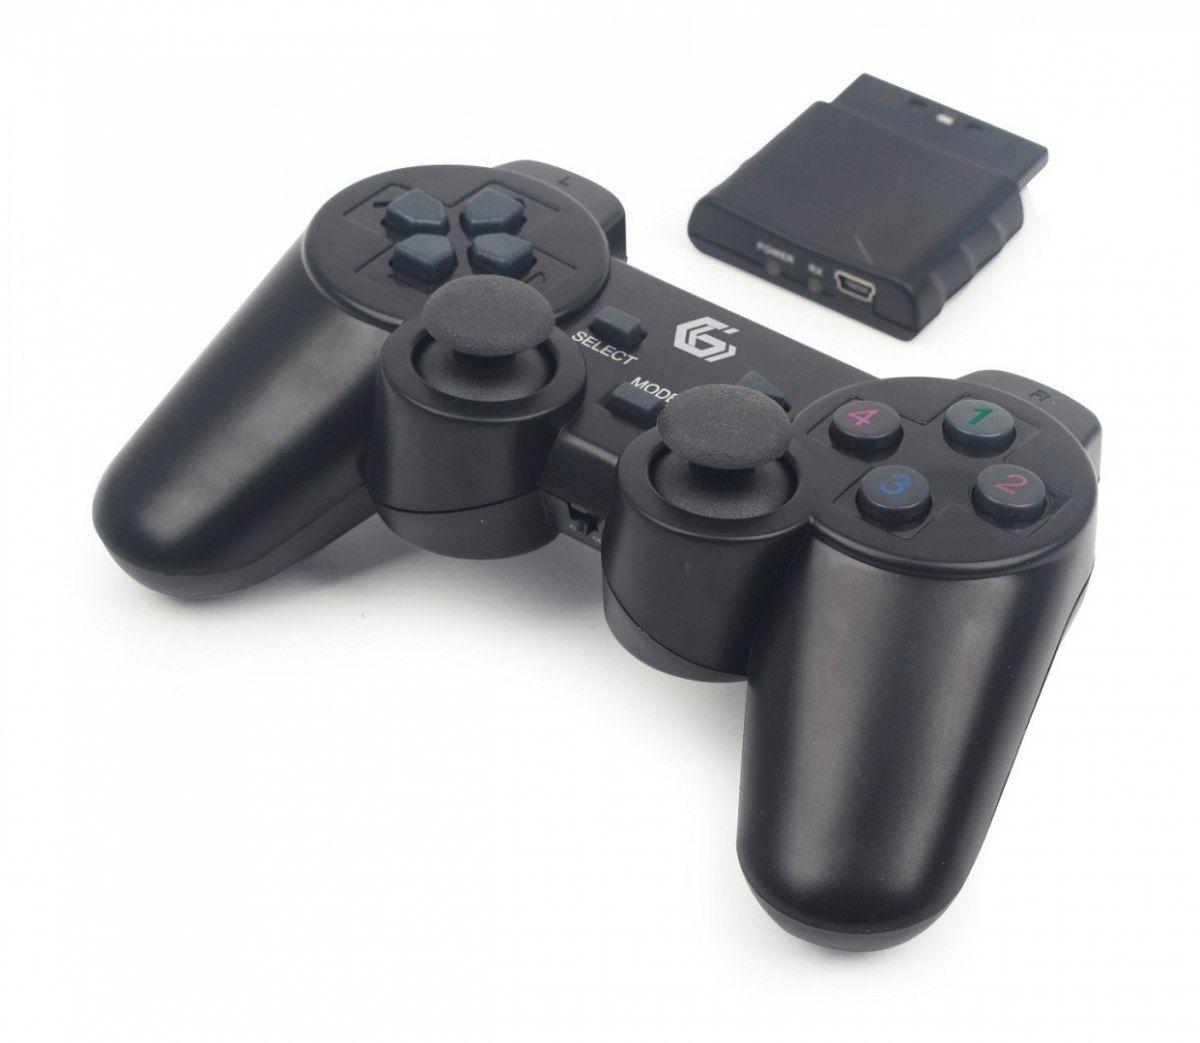 Gamepad bezprzewodowy Gembird JPD-WDV-01 (dual vibration)